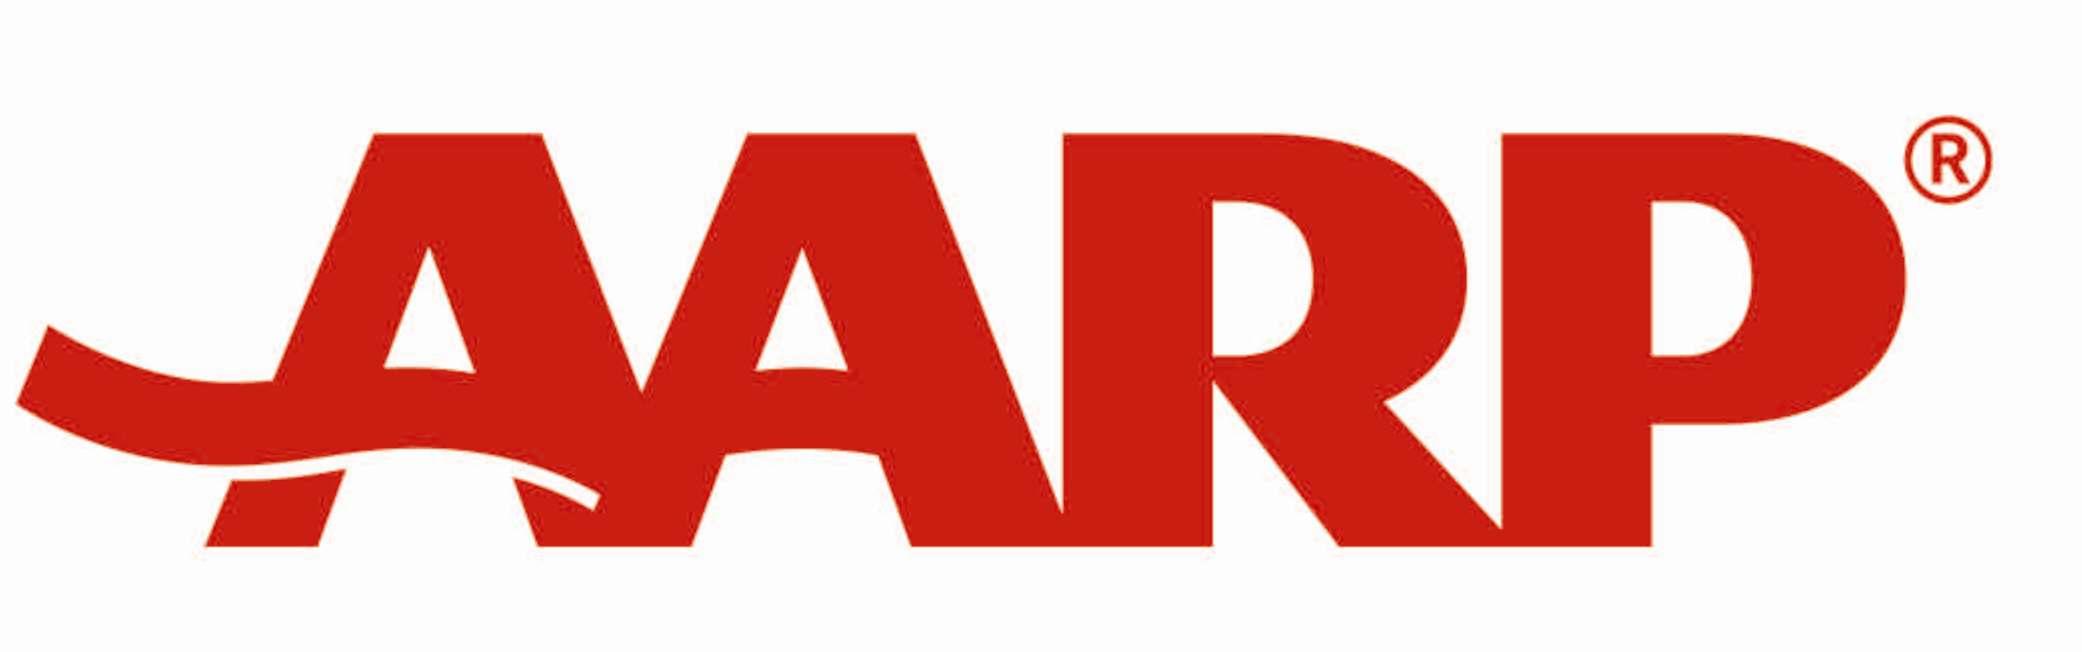 aarp-logo-2.jpg